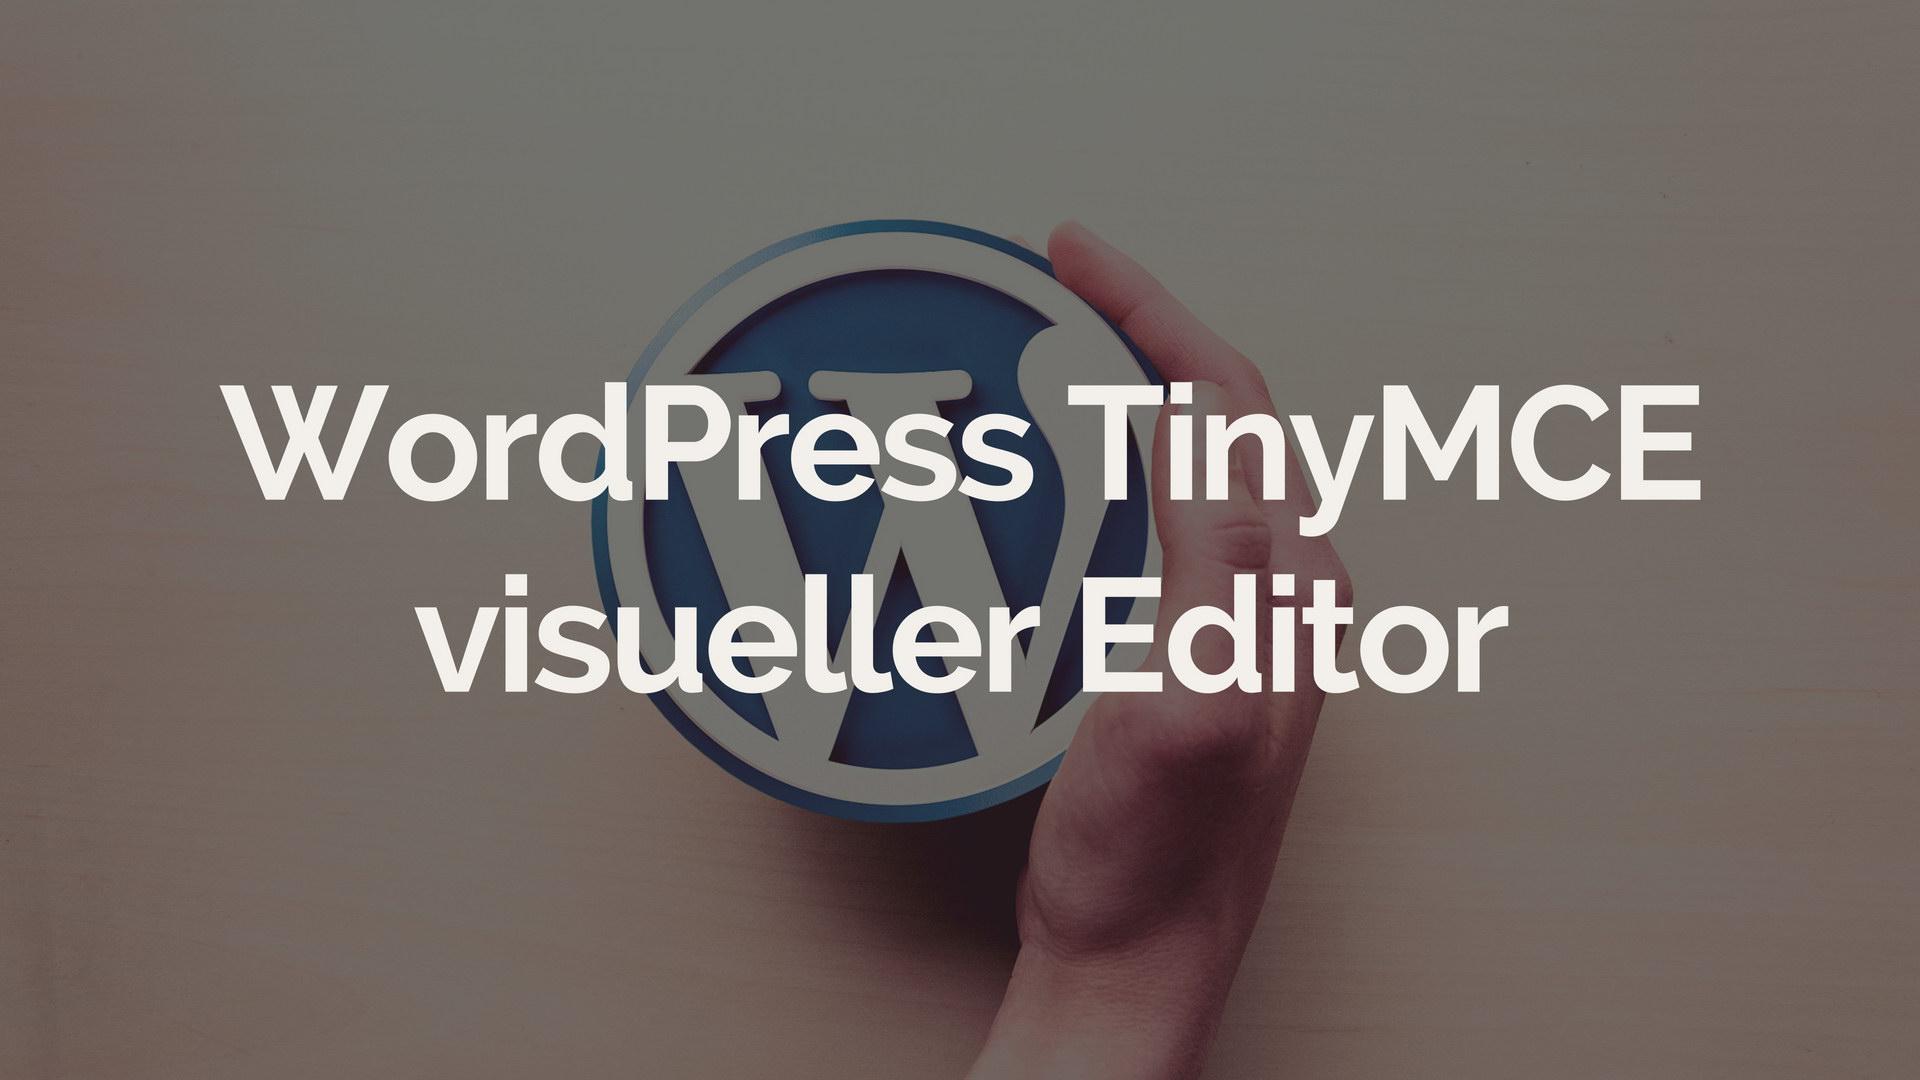 WordPress TinyMCE visueller Editor